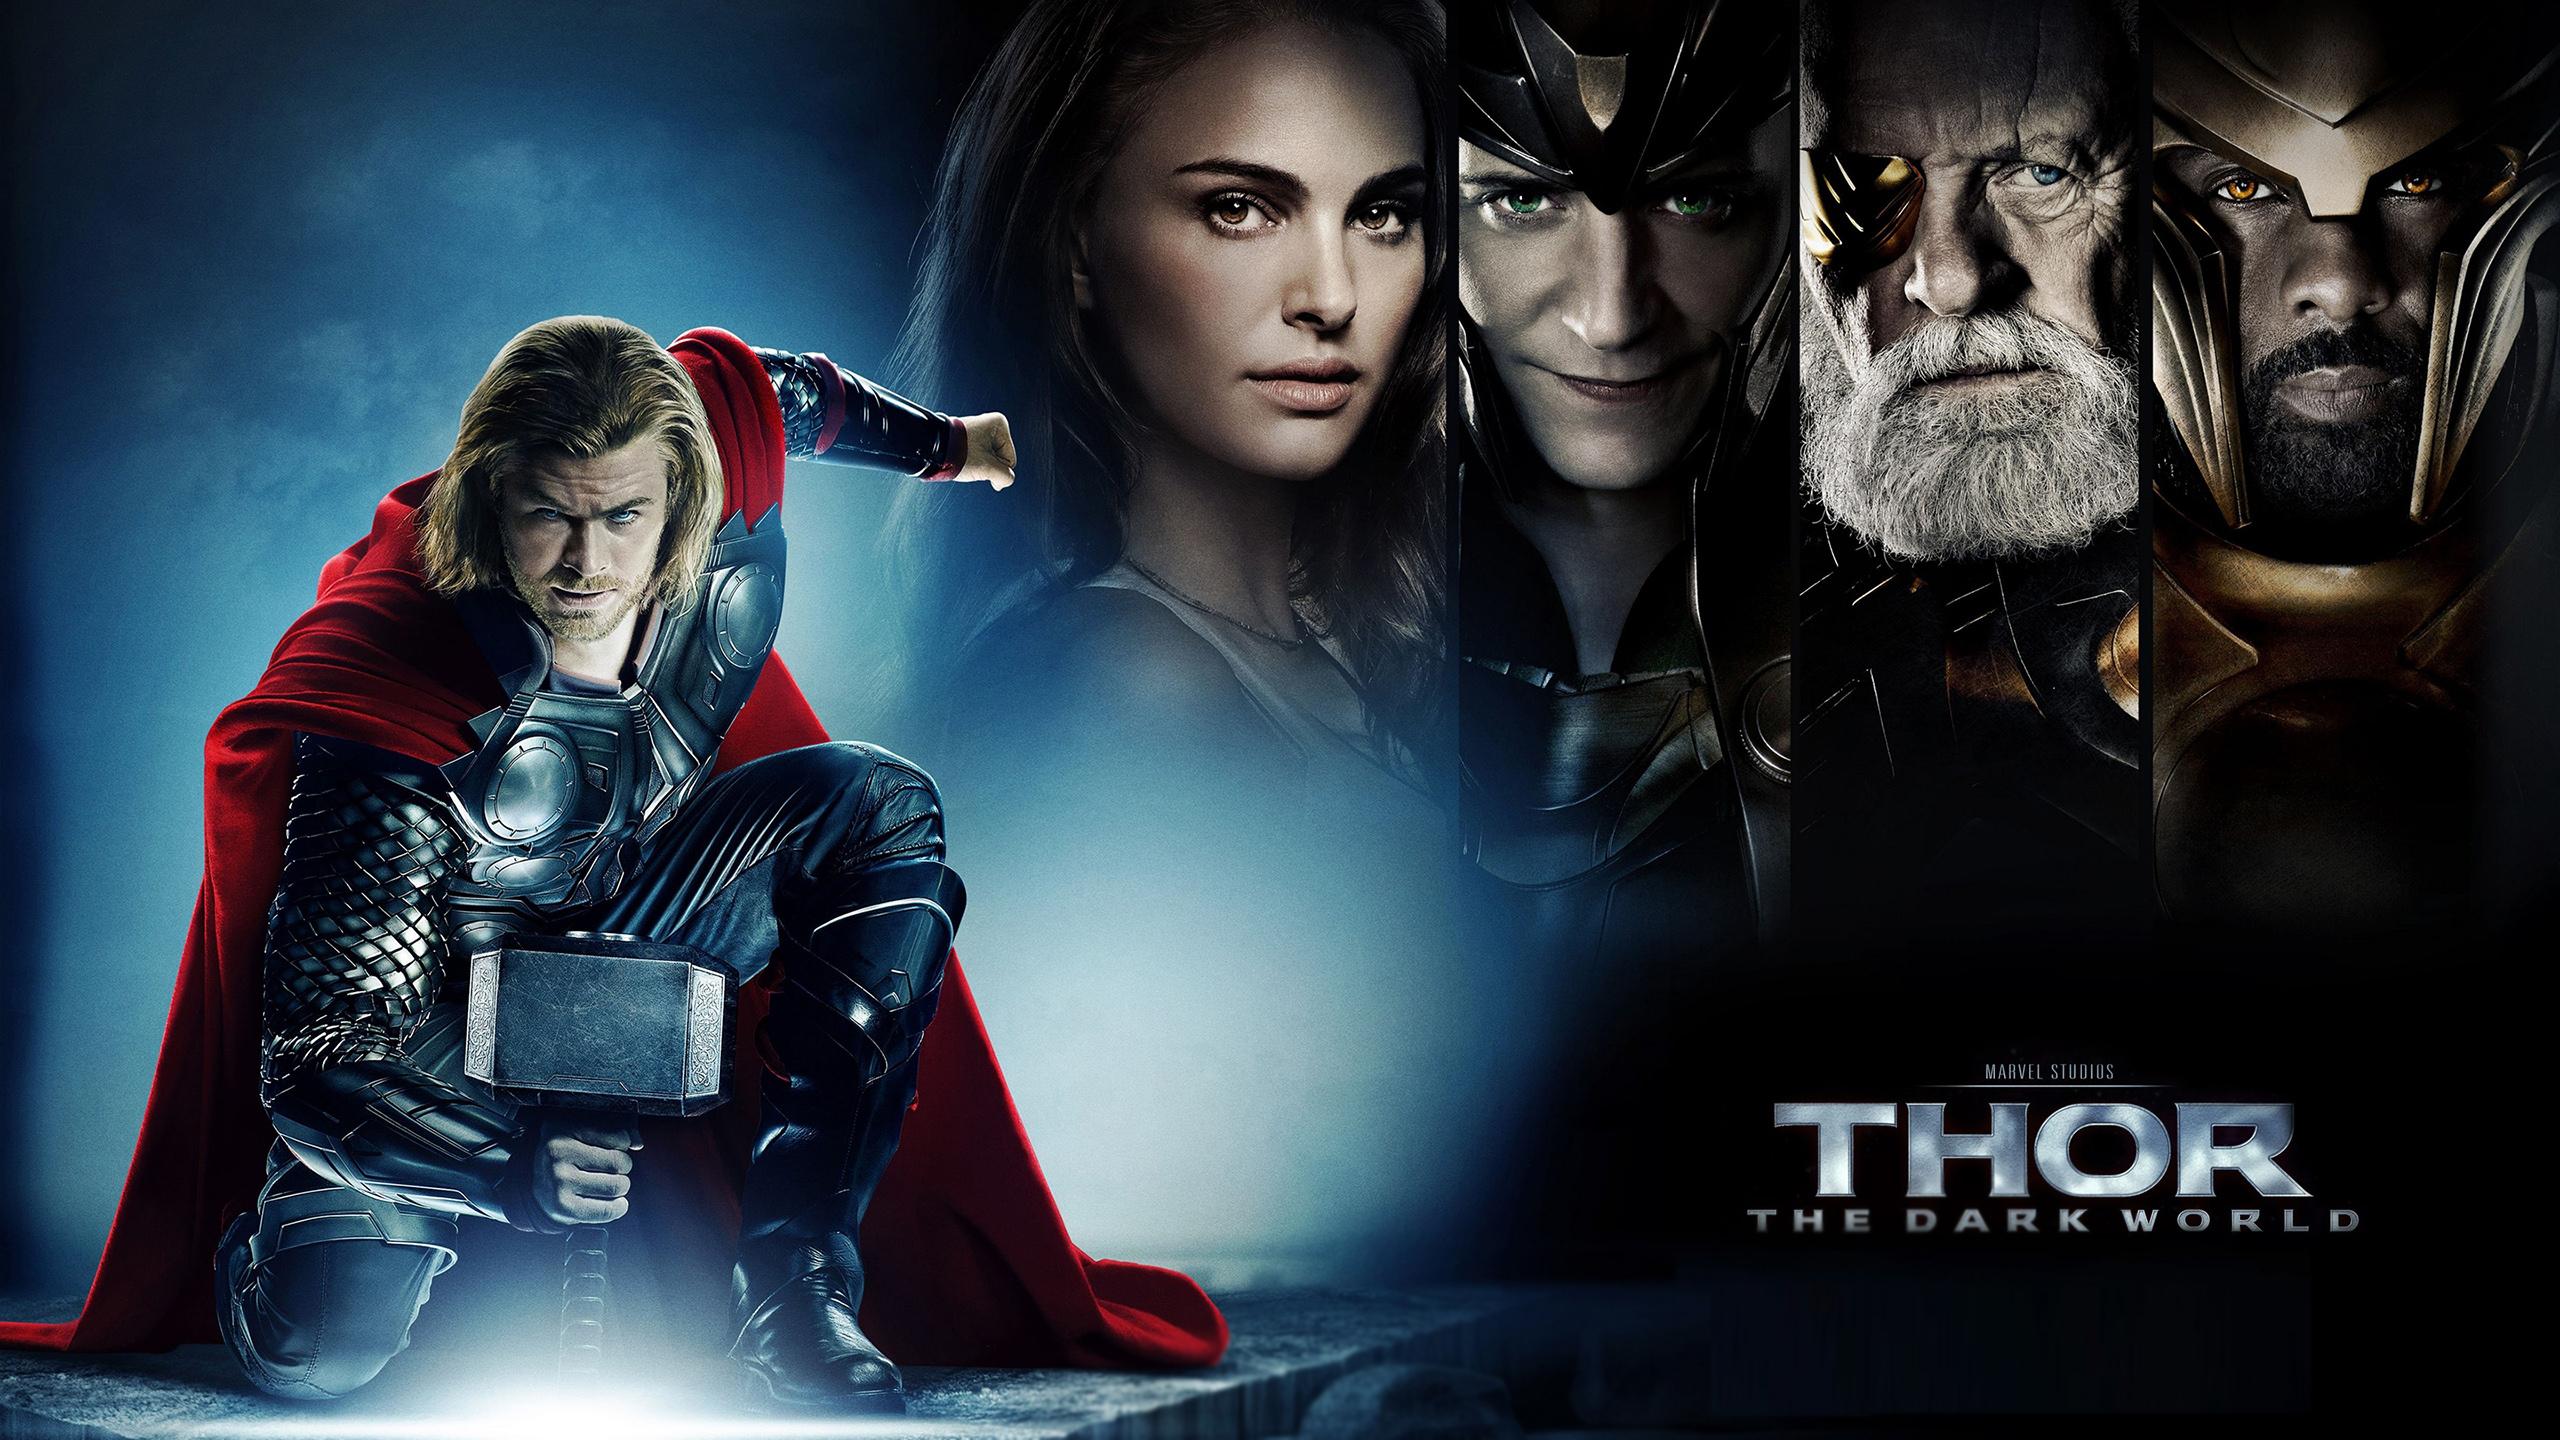 Thor The Dark World wallpaper 6